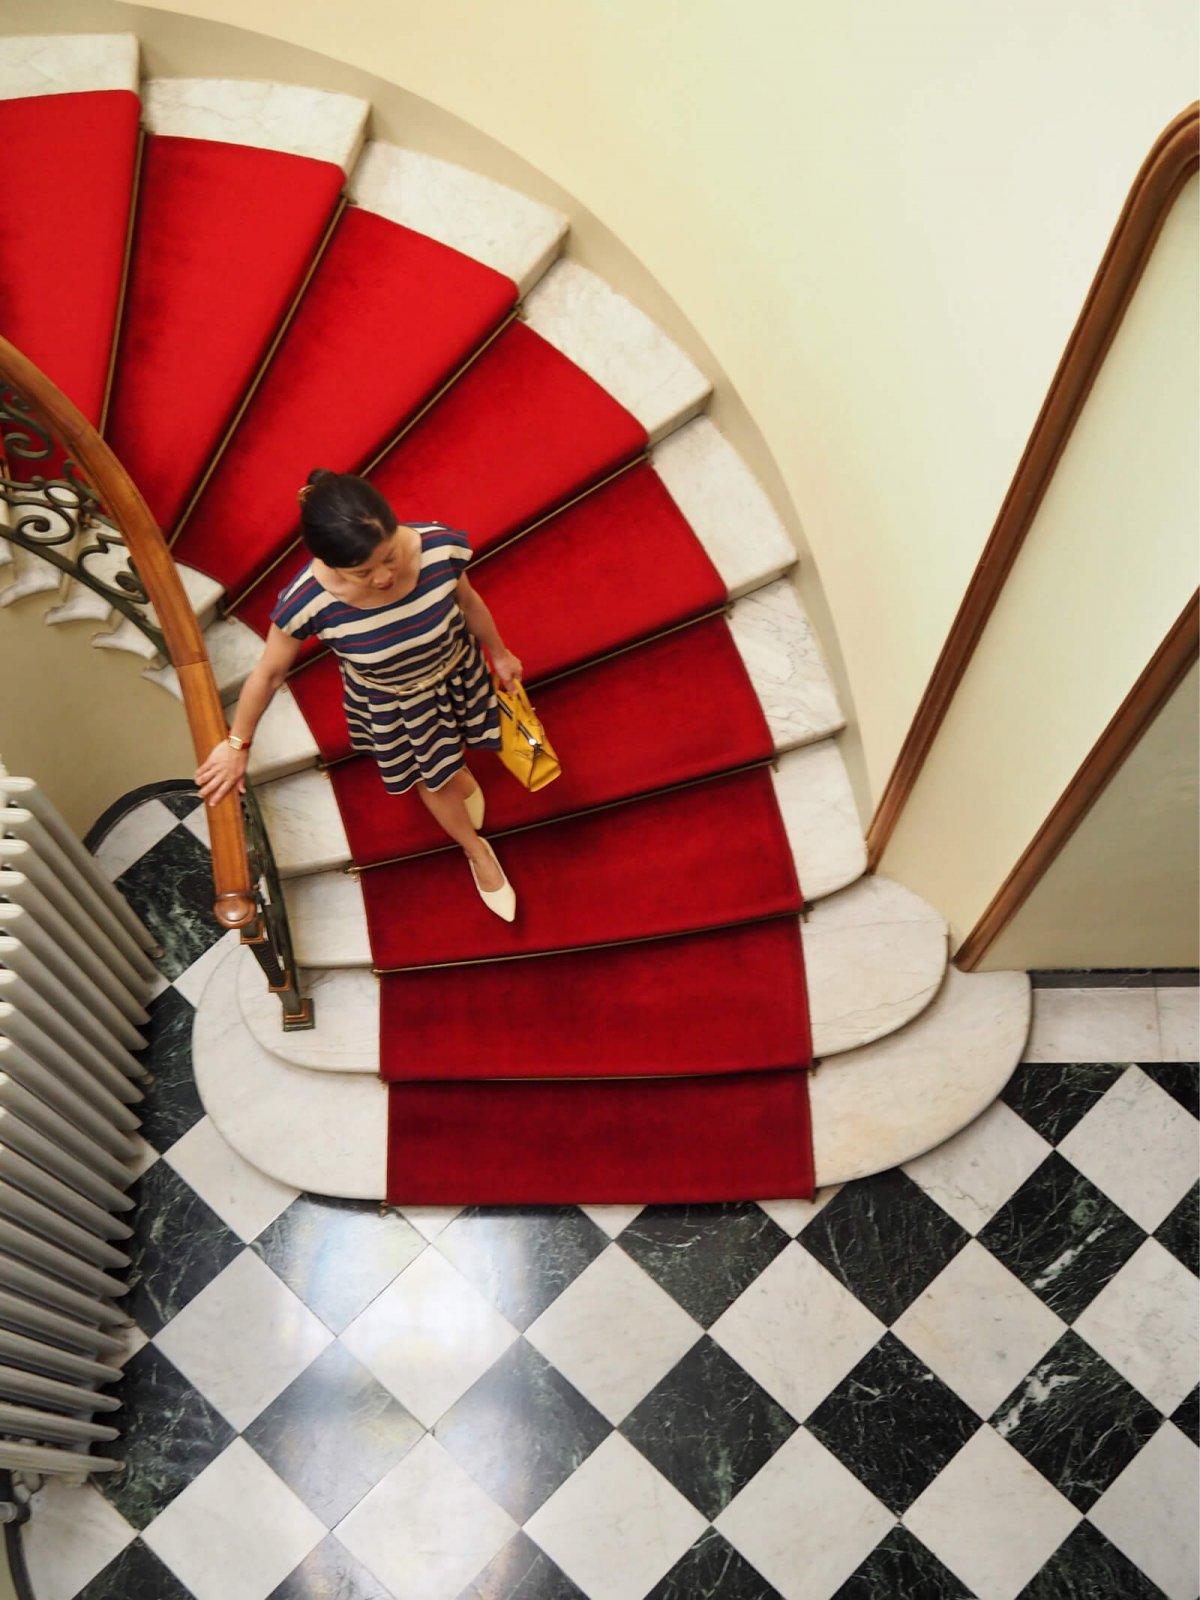 Hotel Splendide Royal in Lugano, Switzerland